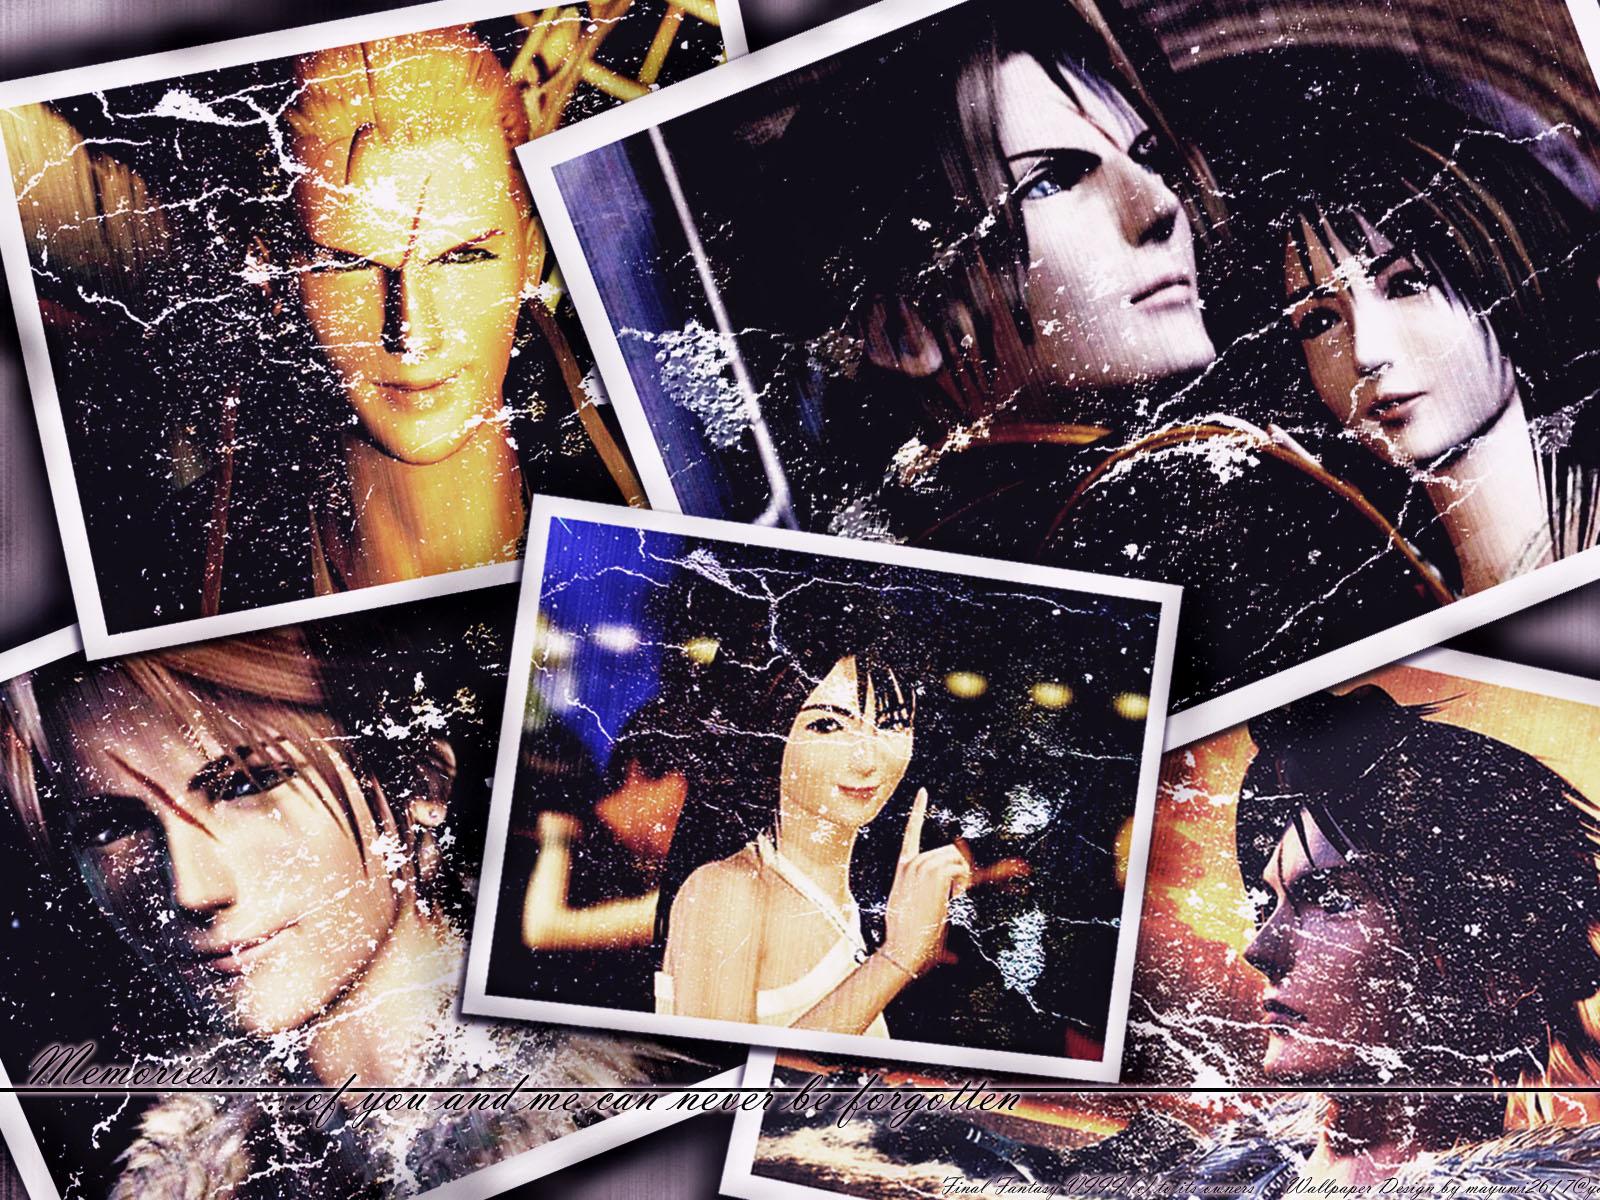 Fondos de pantalla Final Fantasy HD 1600x1200